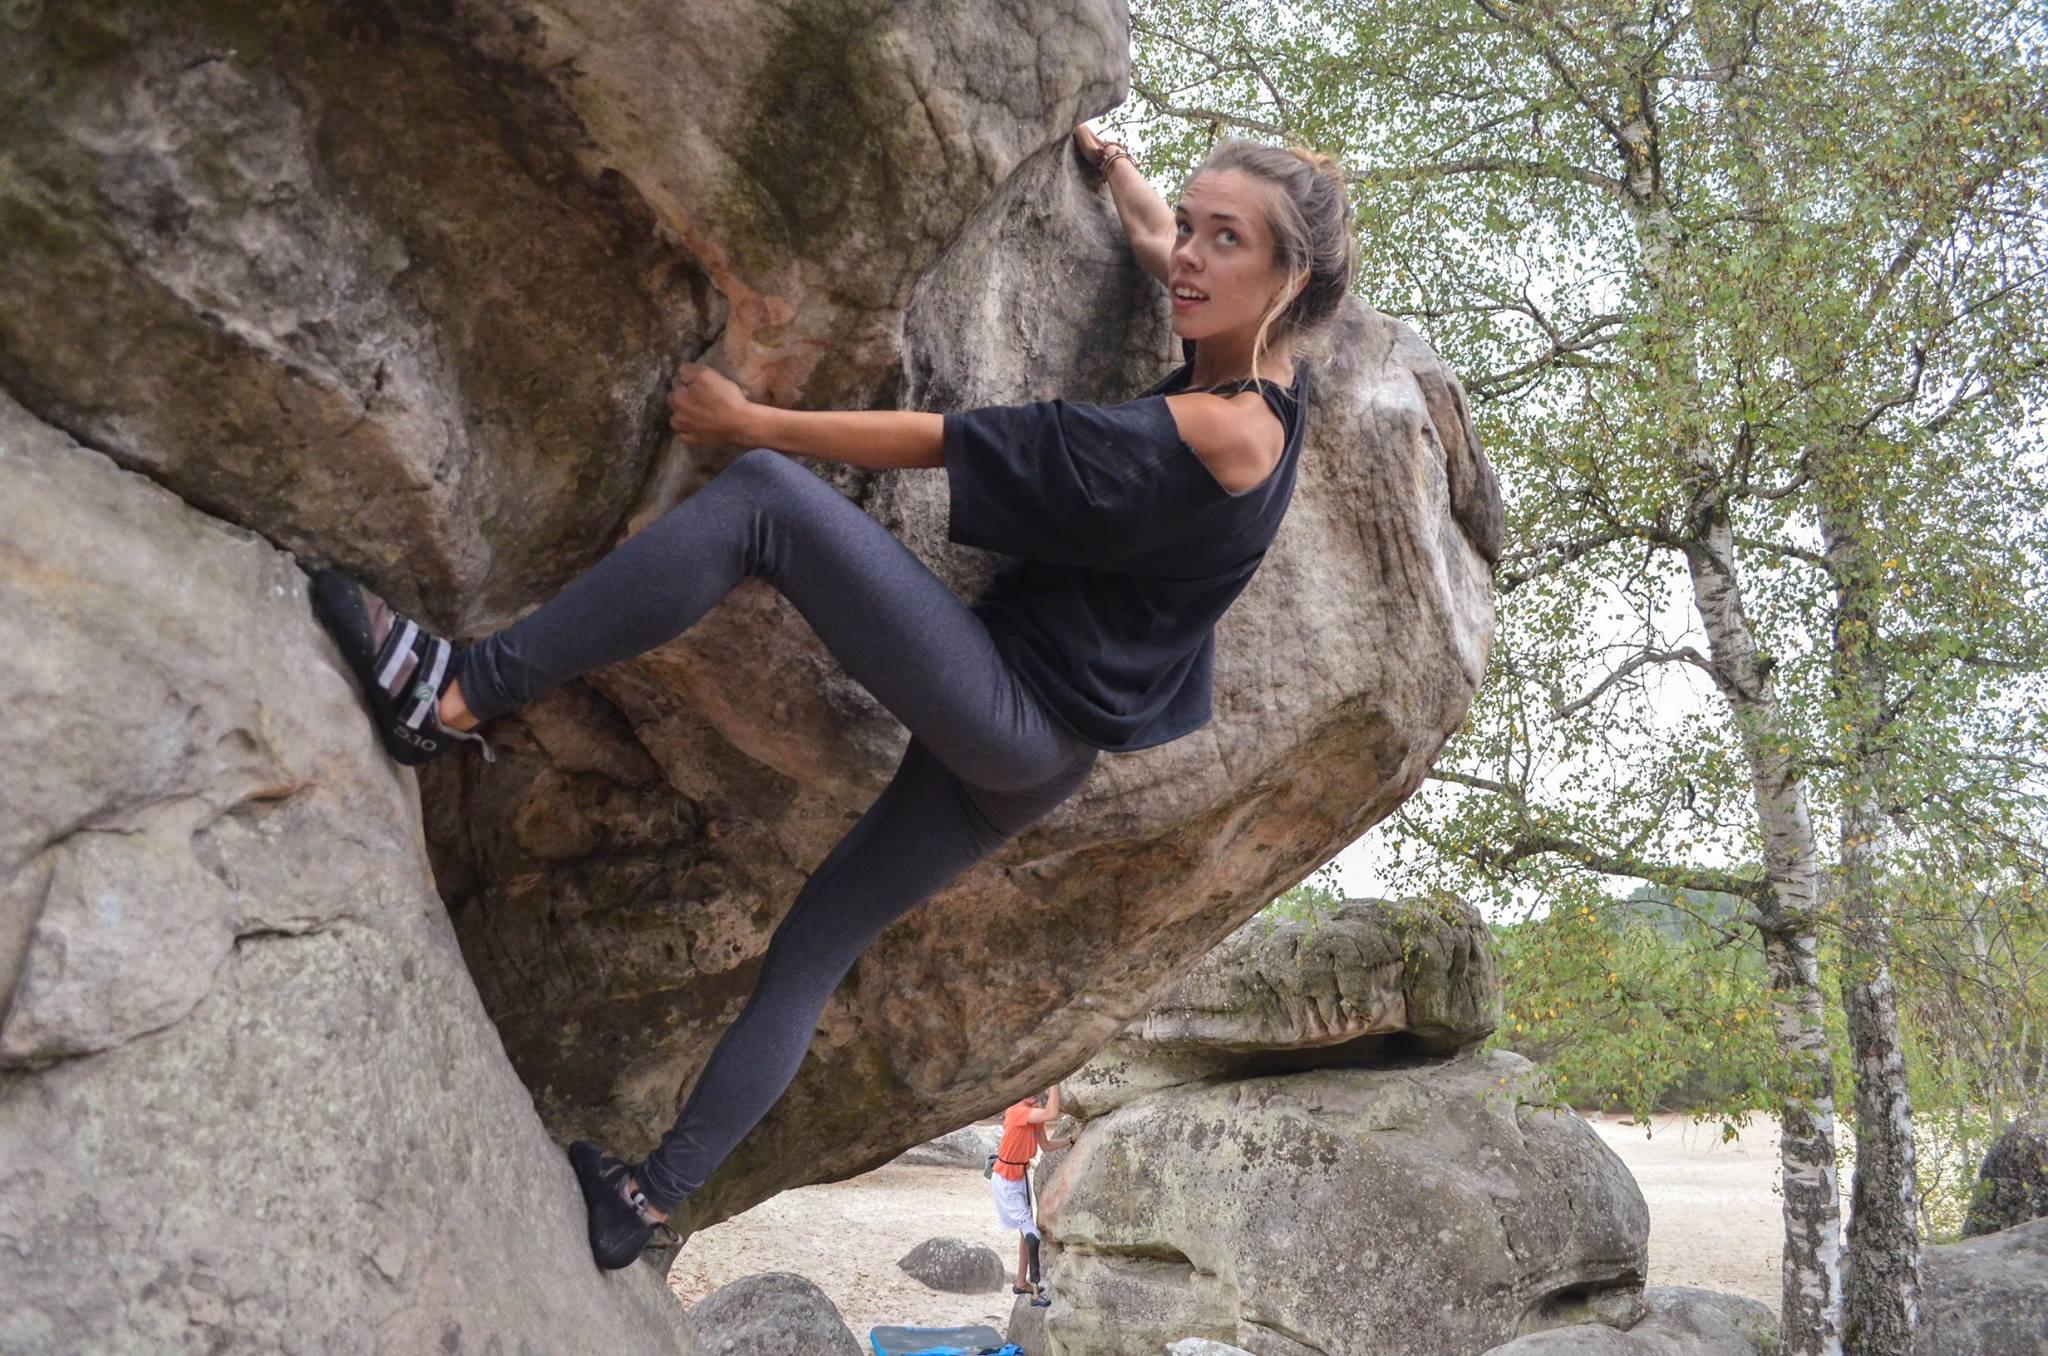 Photo: Phillip Kaminski - Kristina in Fontainebleau with Adaptive Climb Group